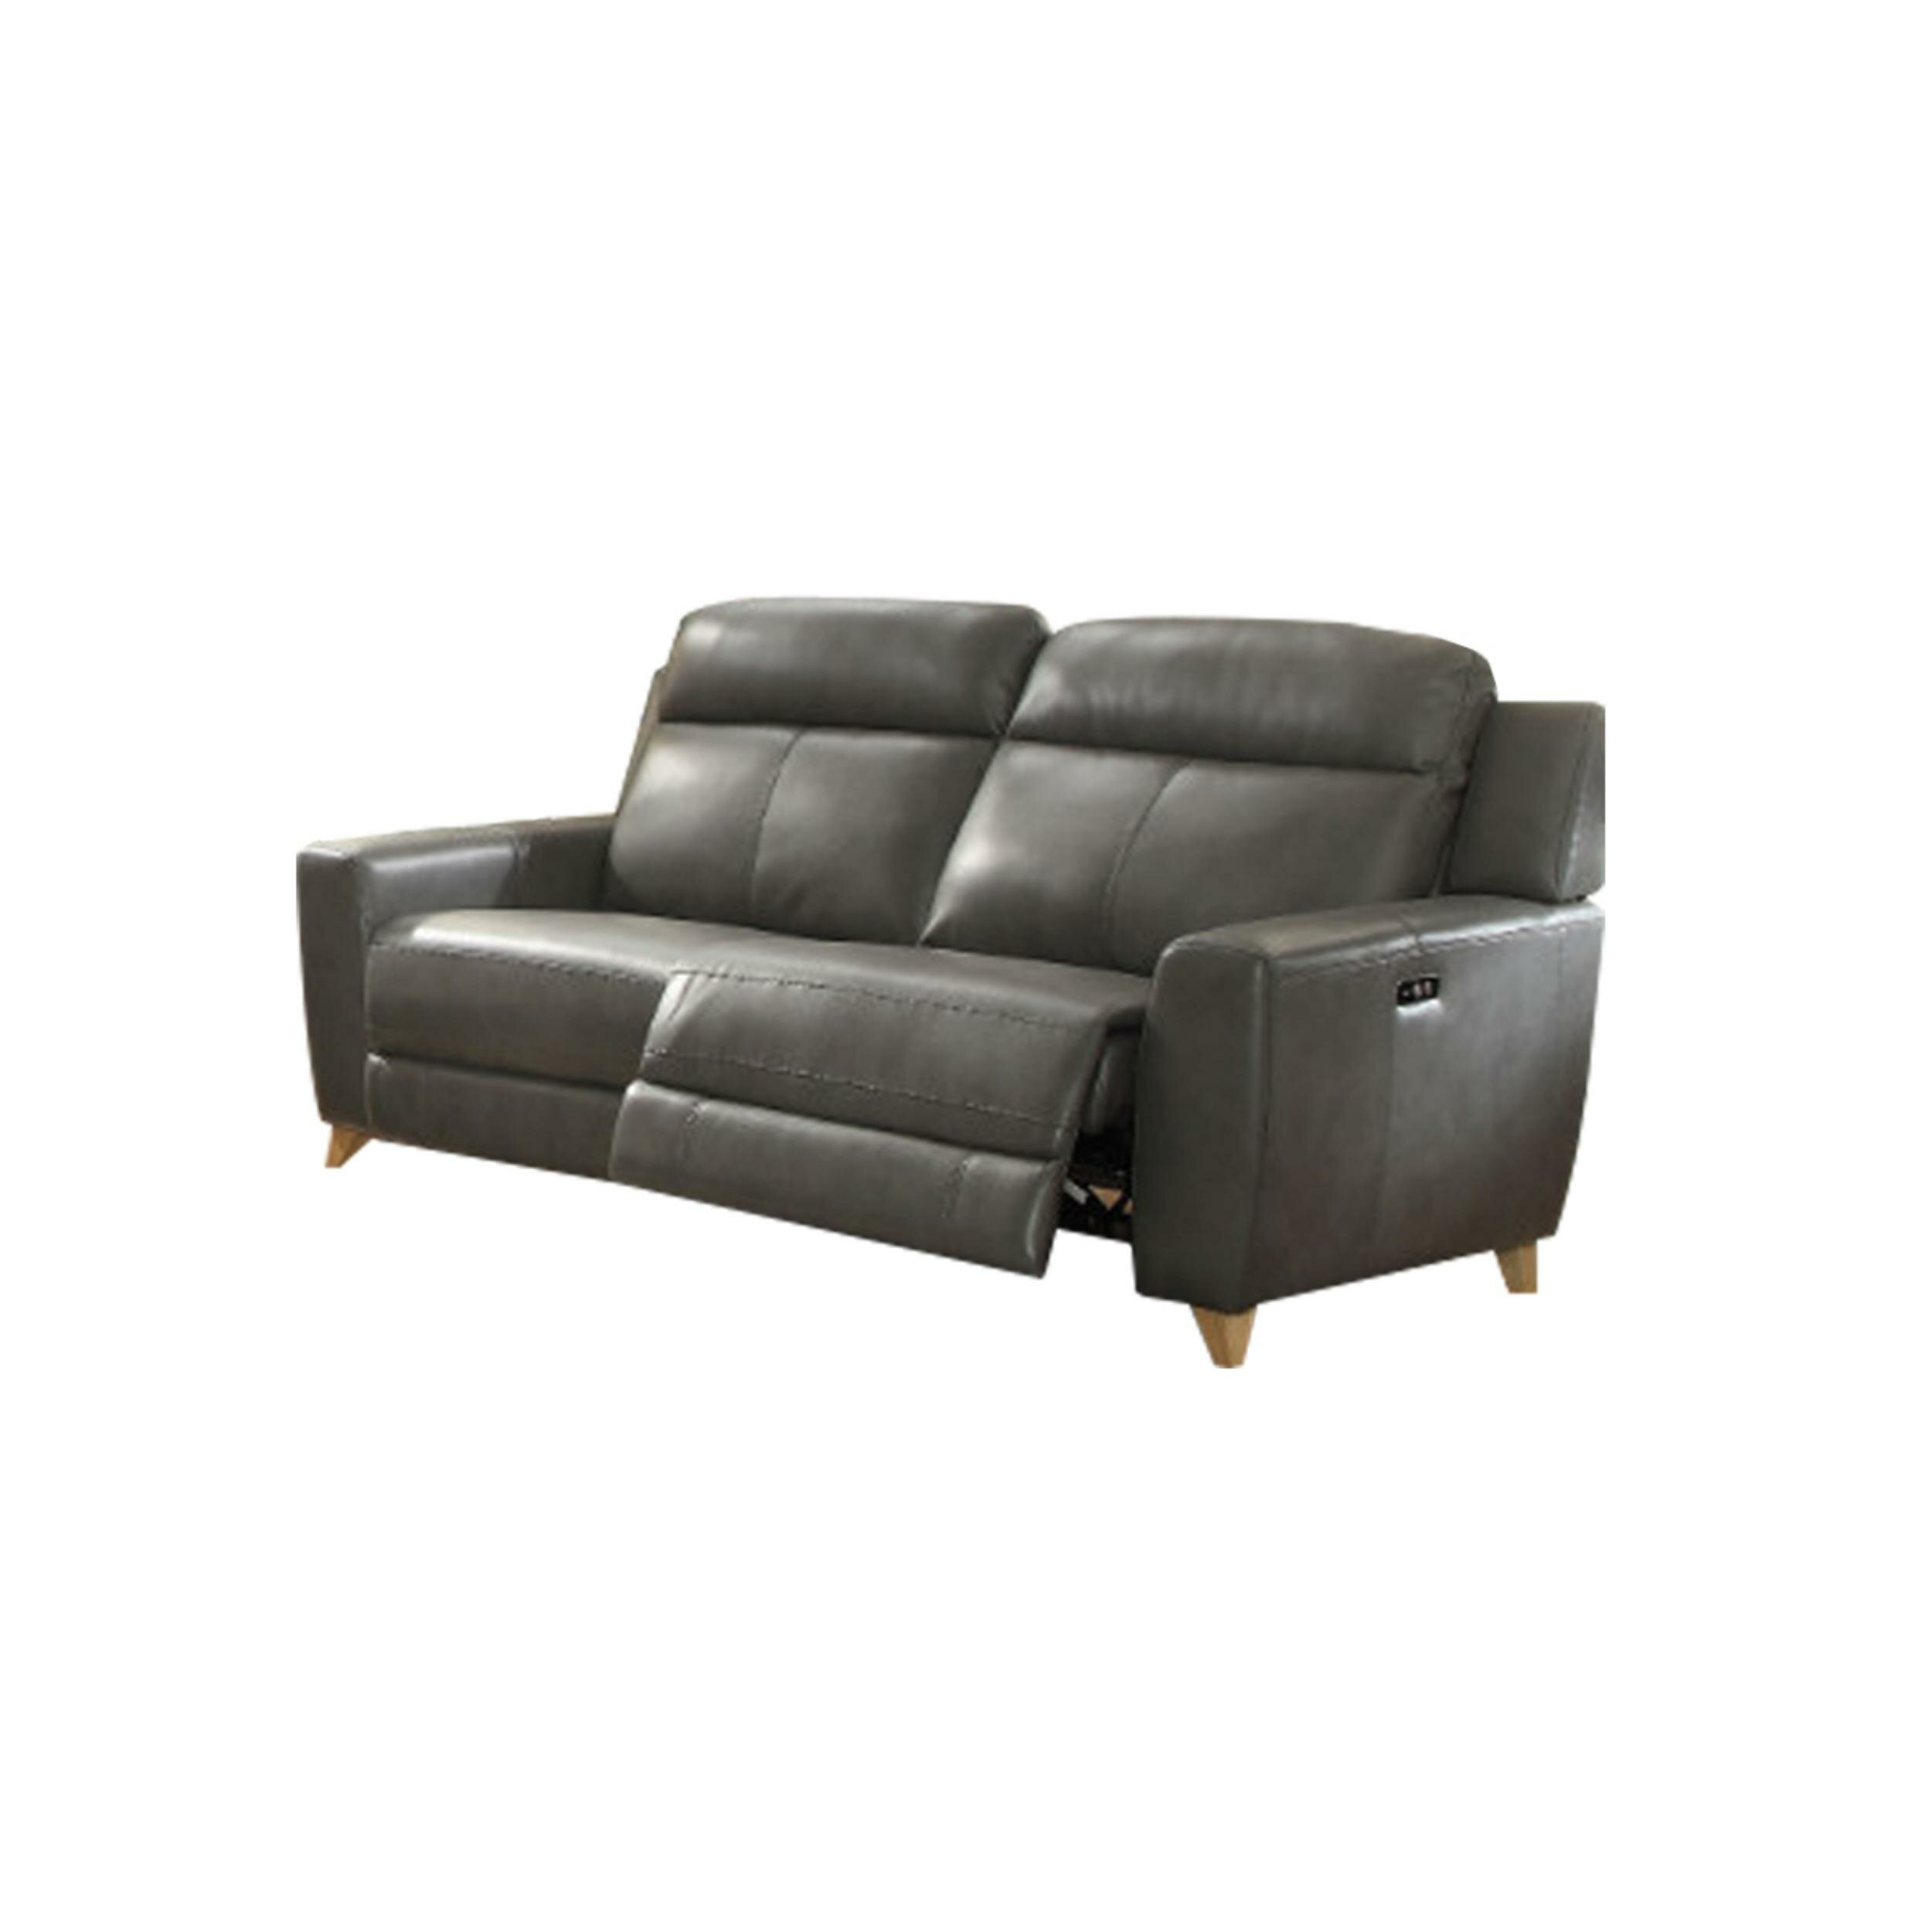 Prime Virenque Reclining Sofa Pabps2019 Chair Design Images Pabps2019Com